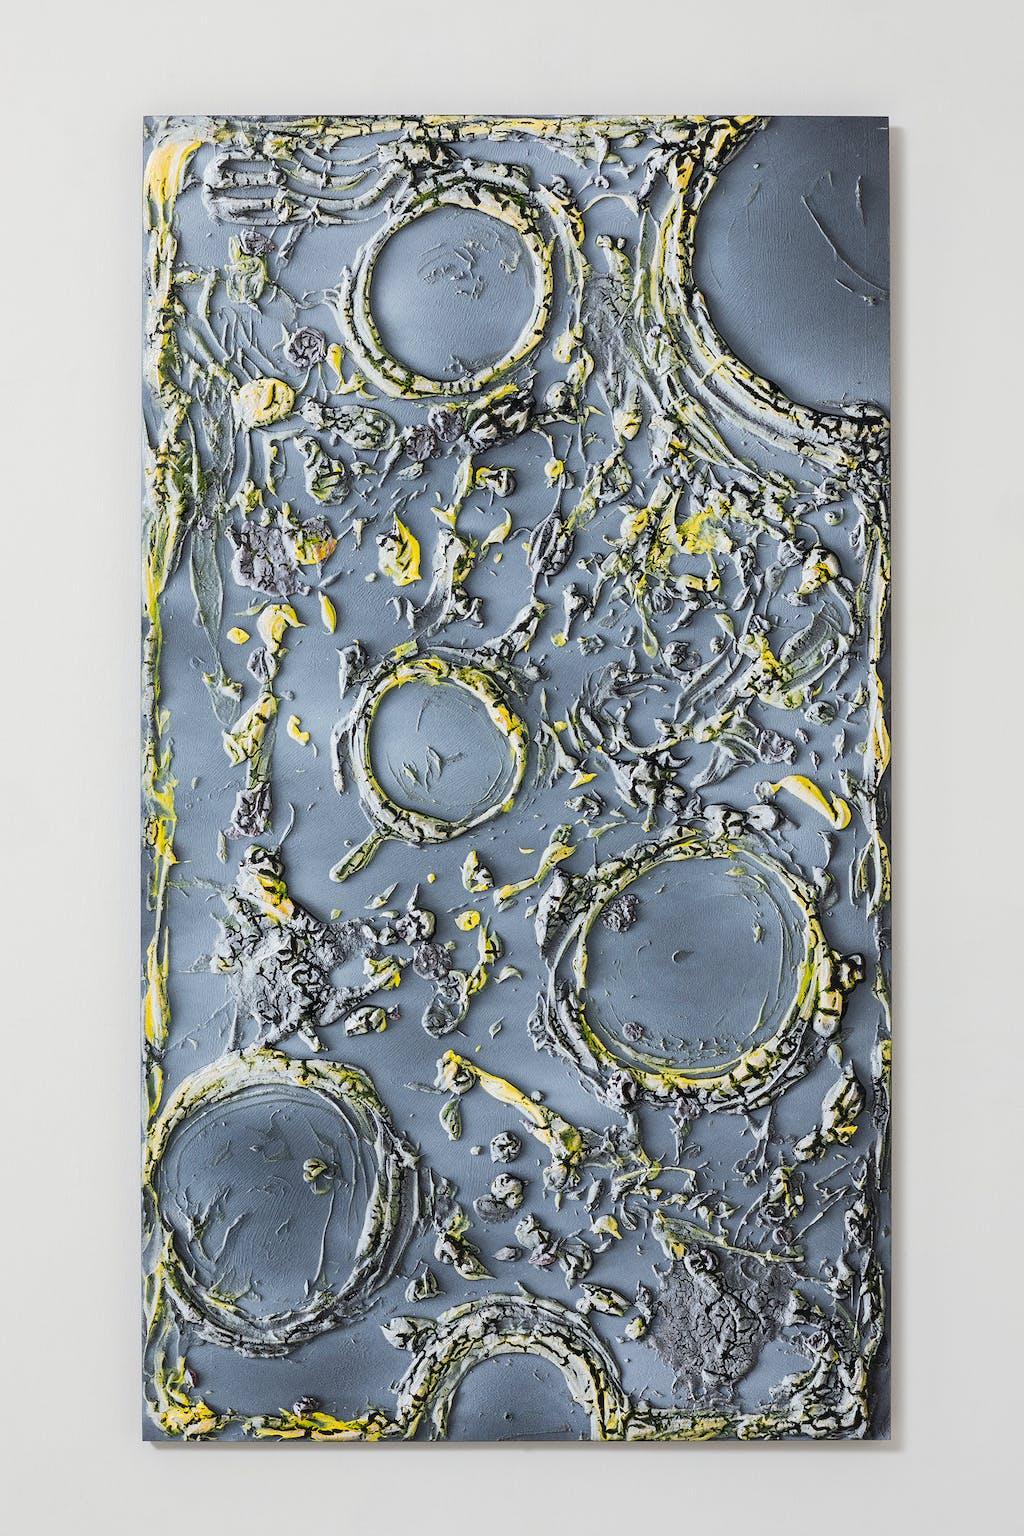 Untitled (CHEESE), 2020 Mdf, glue, acrylic paint, spray paint, vinyl 139 x 77,5 cm - © Paris Internationale